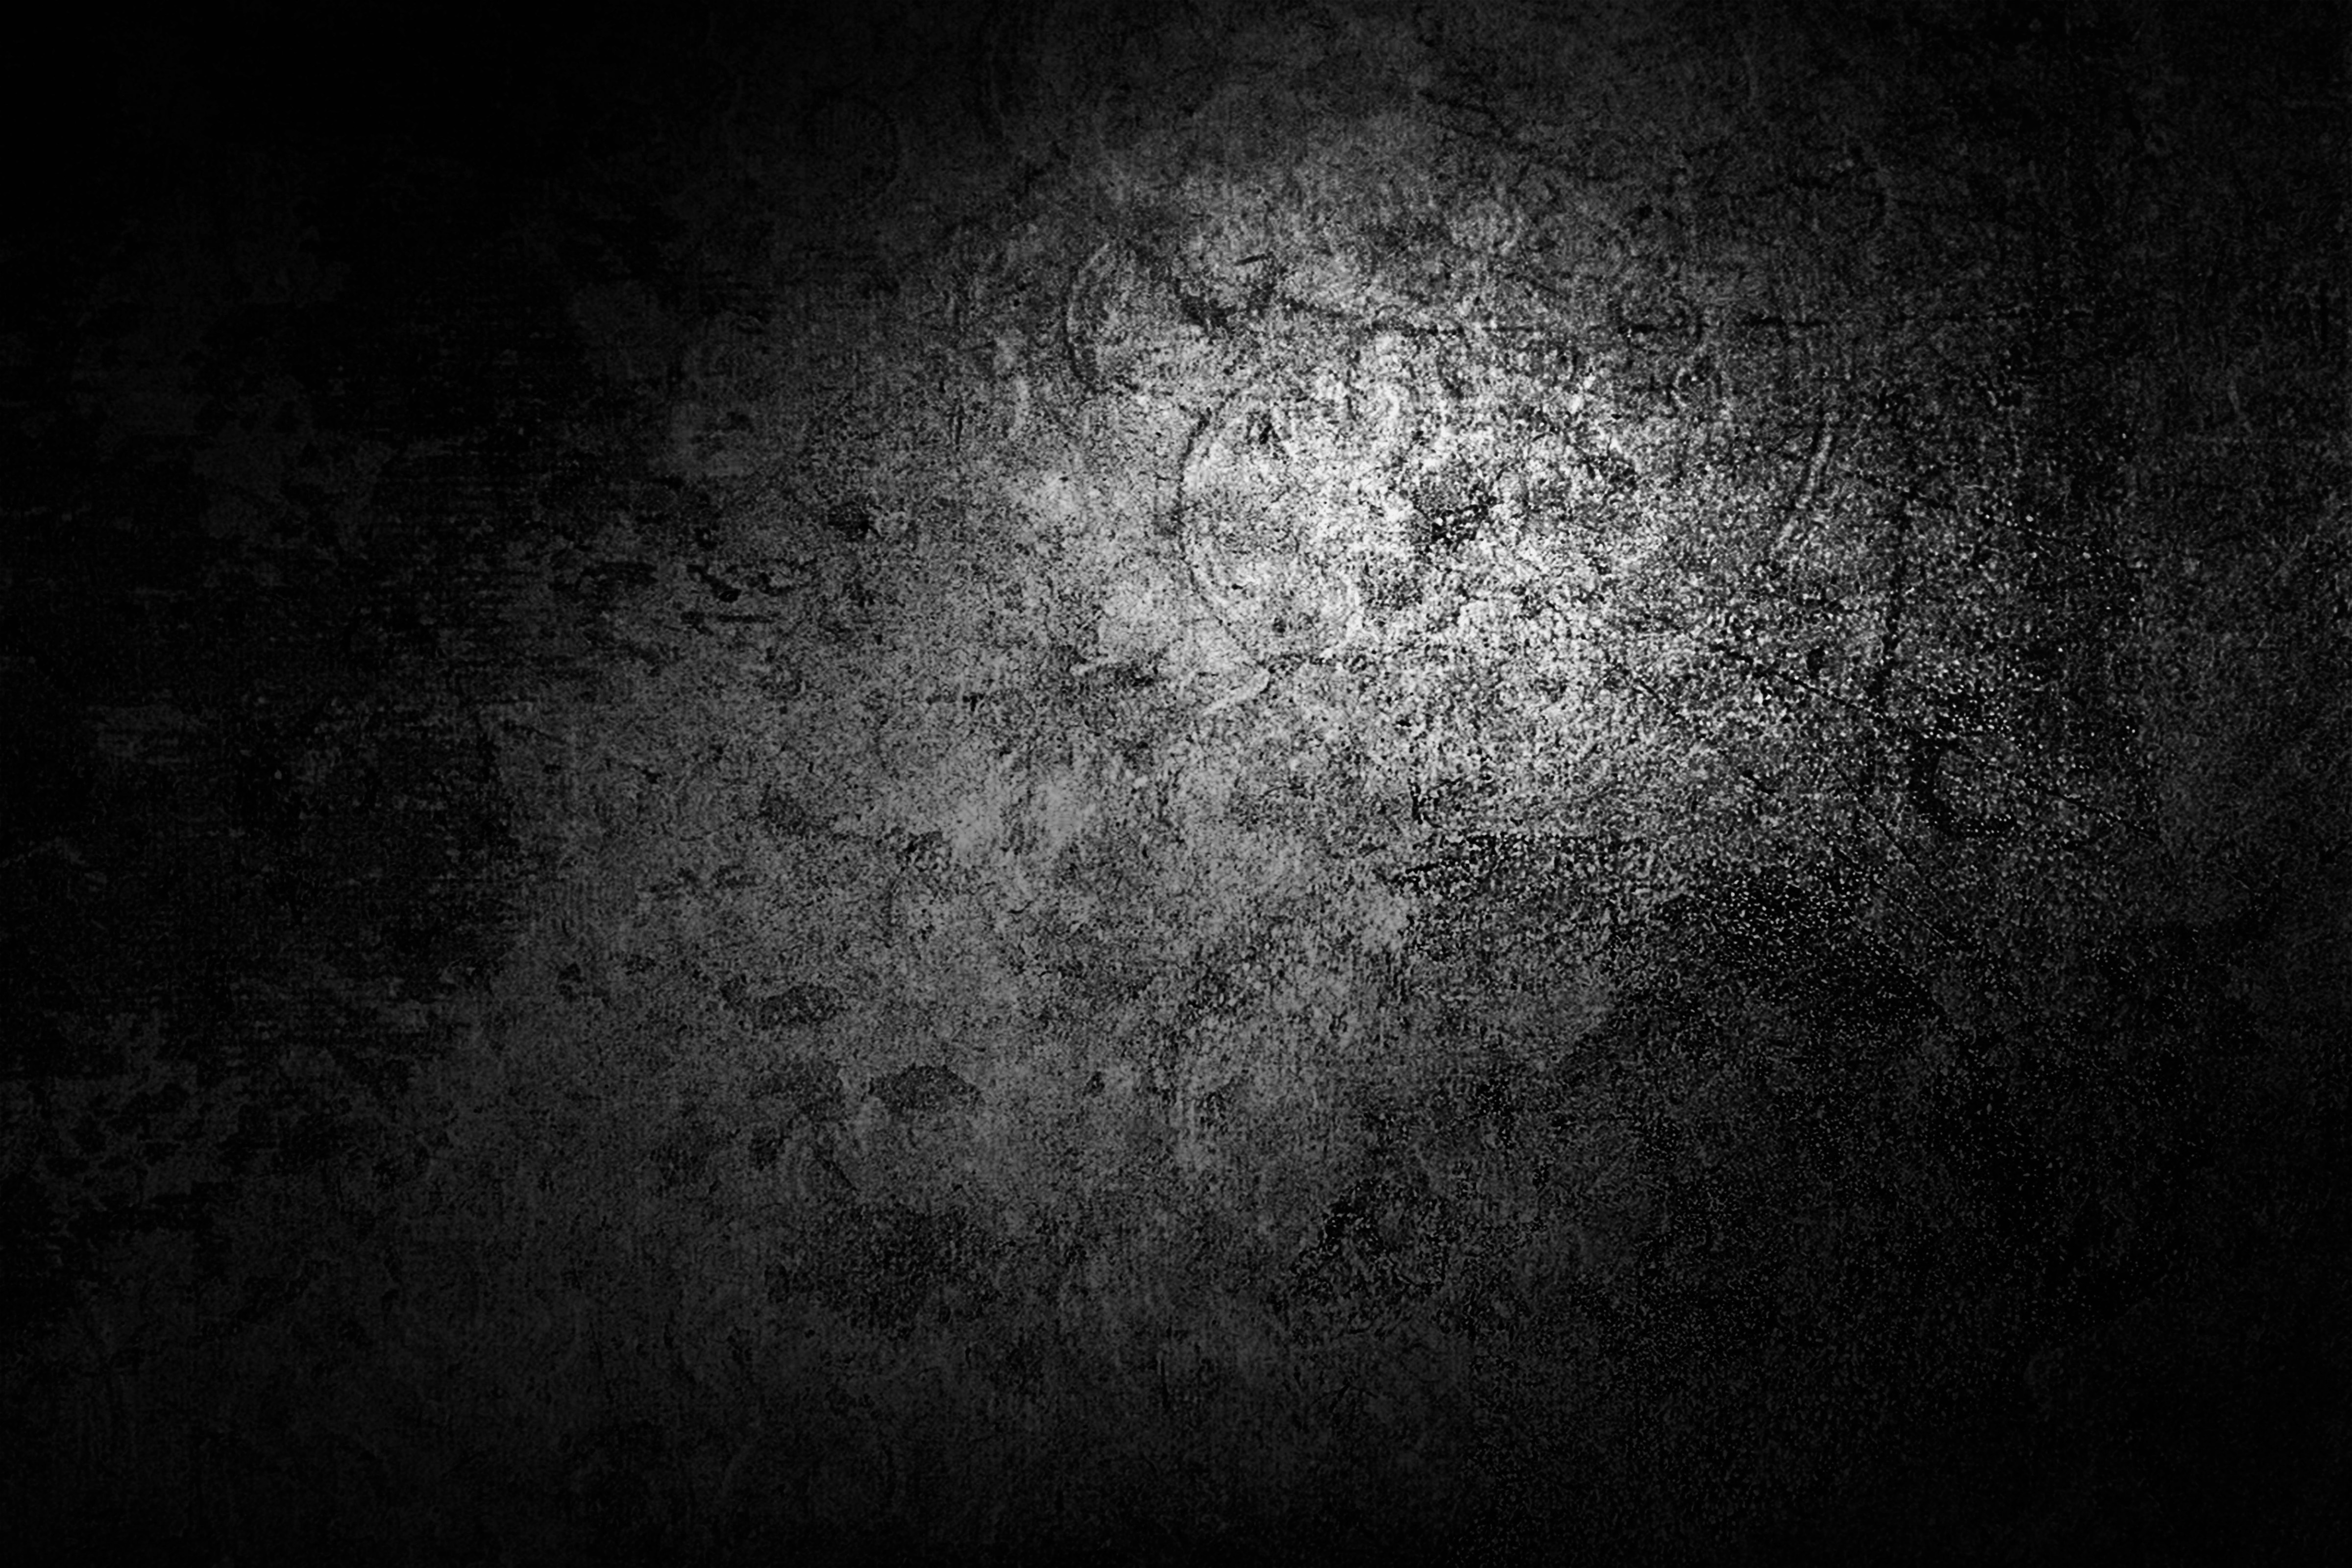 10 high resolution Dark Grunge textures taken from other images 4800x3200